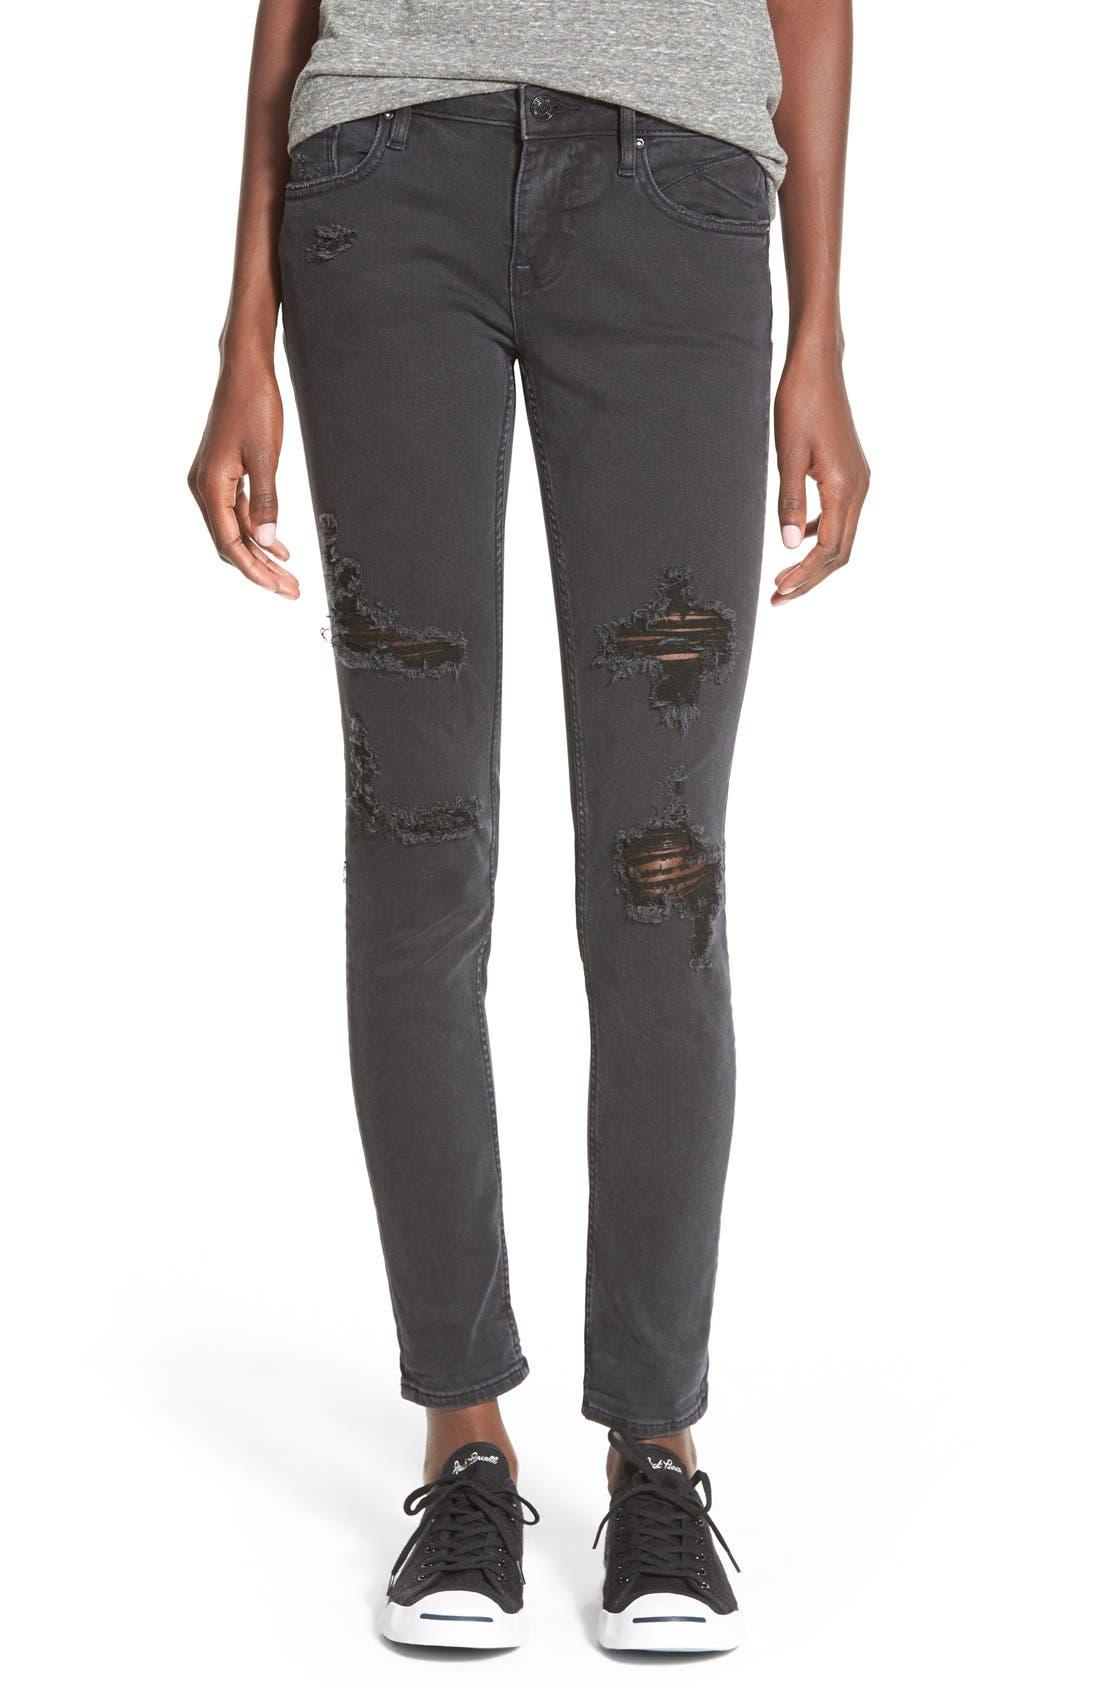 Alternate Image 1 Selected - Vigoss 'Tomboy' Destroyed Jeans